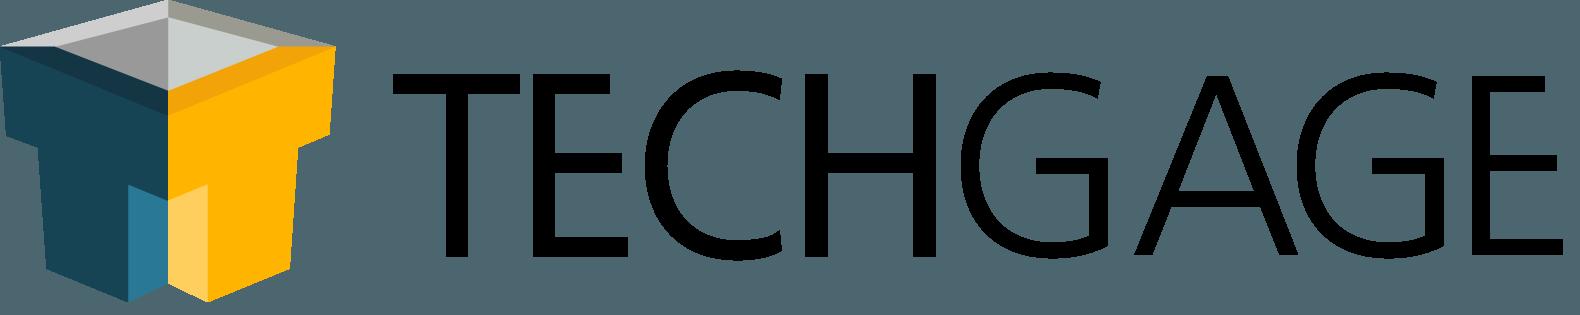 Techgage Logo - Primary - 1580x315